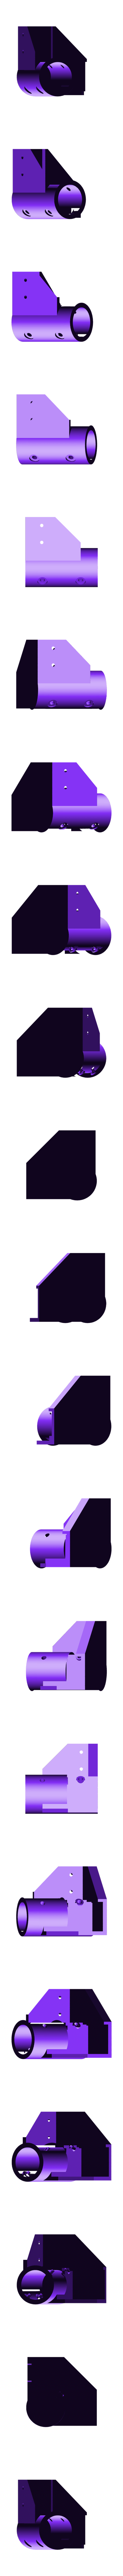 corner_bottom.stl Download free STL file FDM Printer de Kleine Reus 300x300x900 • 3D printable object, Job